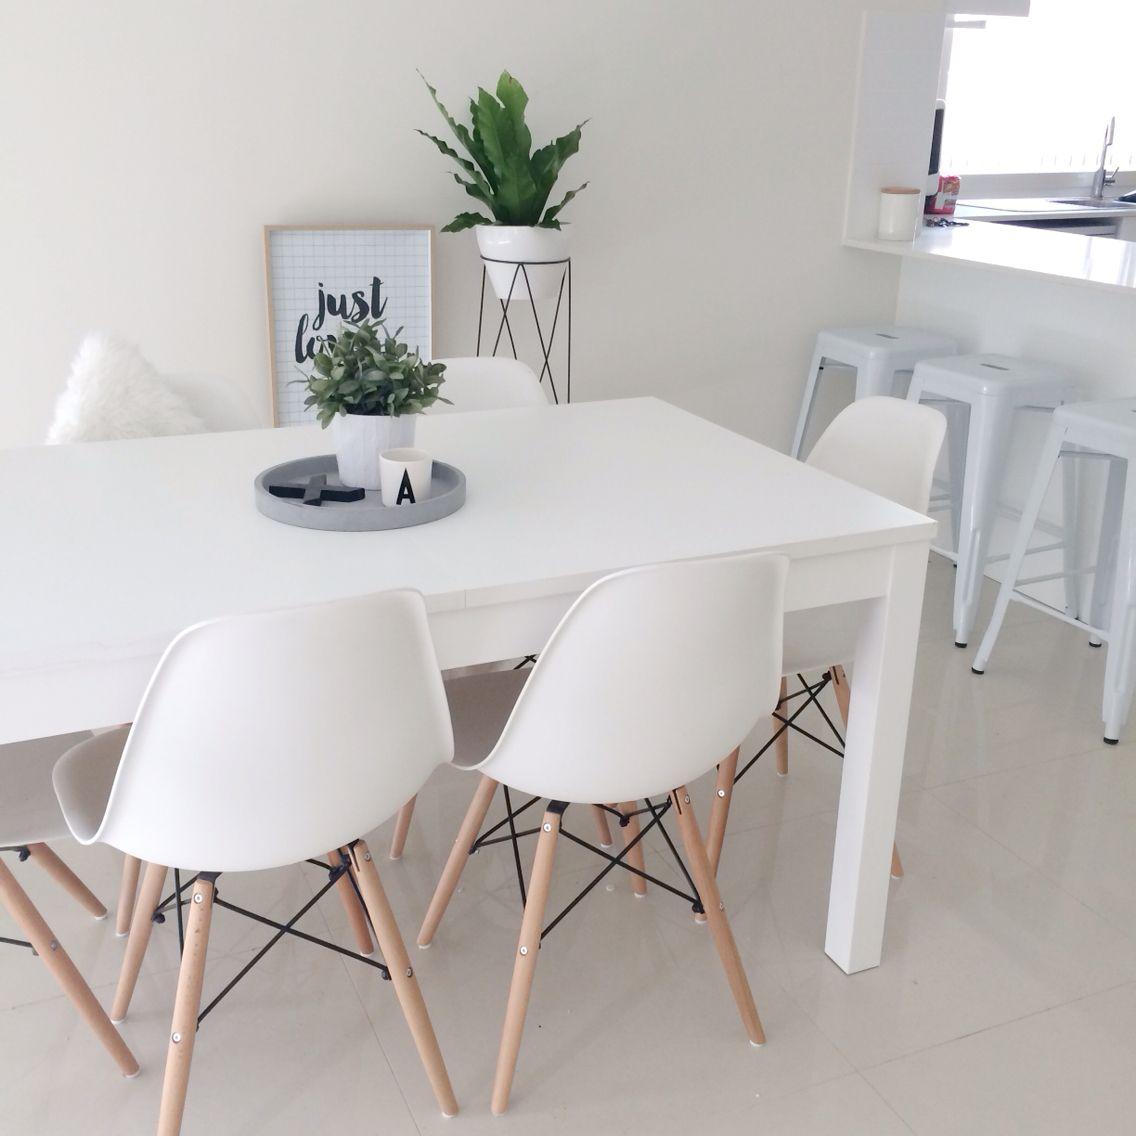 Simple Minimalist Dining Set: Dining Room. Eames, White, Green, Minimal.